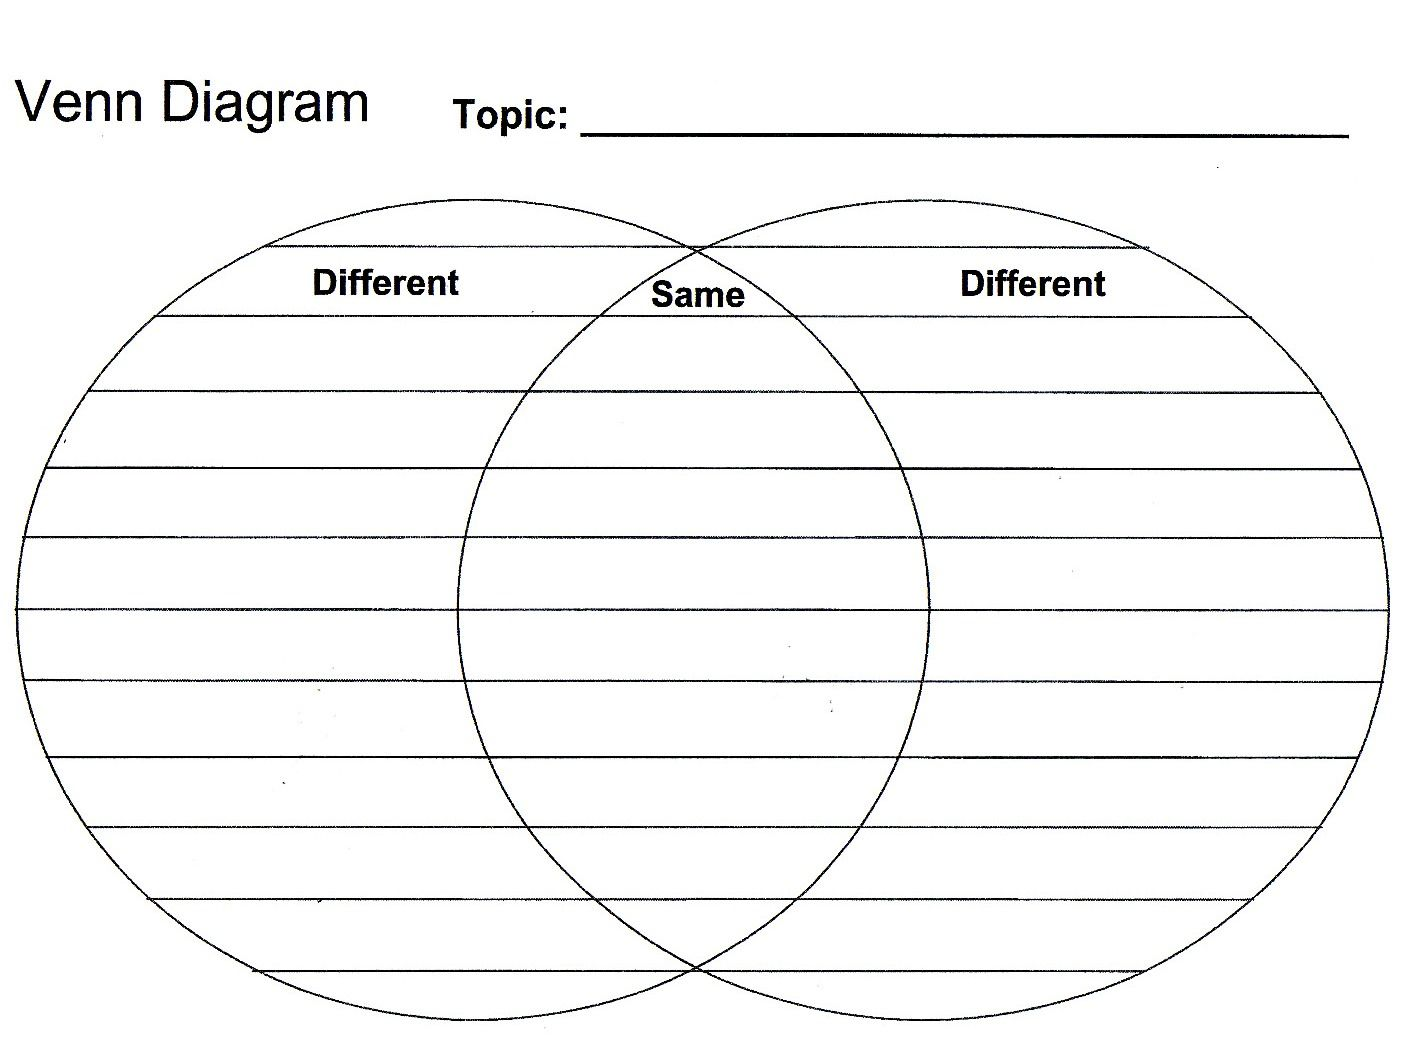 venn diagram worksheet venn diagrams classroom ideas classroom inspiration classroom board  [ 1409 x 1048 Pixel ]